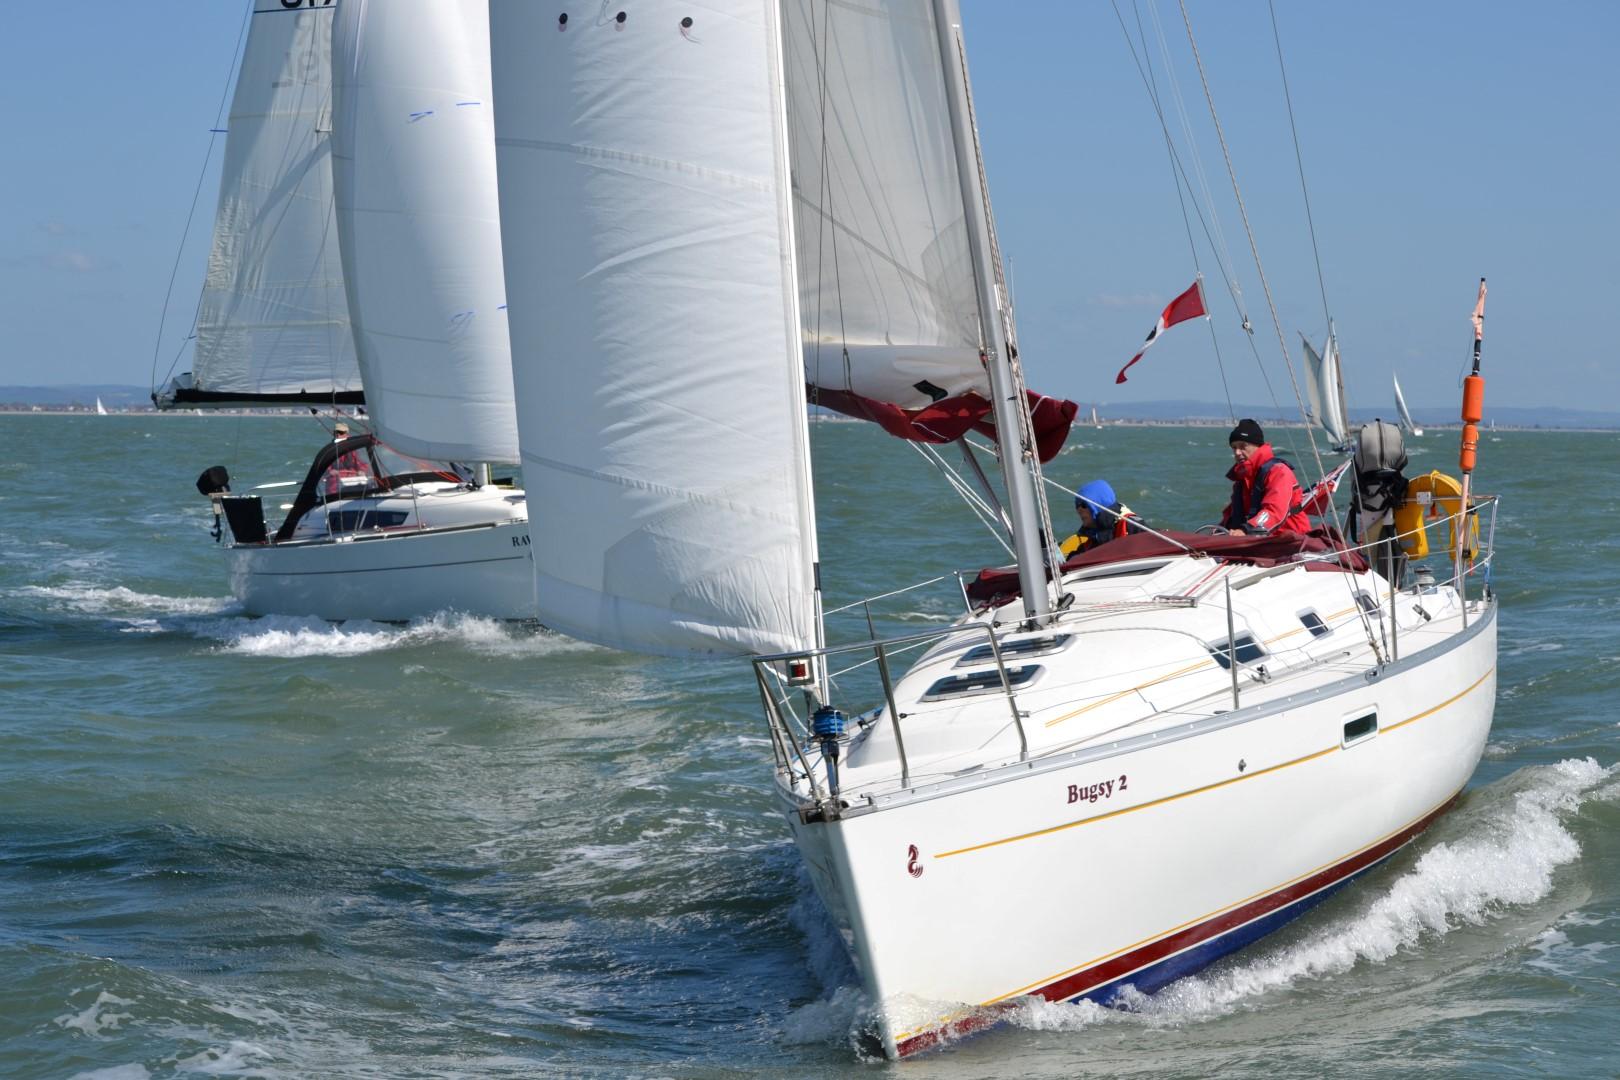 Yacht Cruise Cyc Round The Island Race Cruise